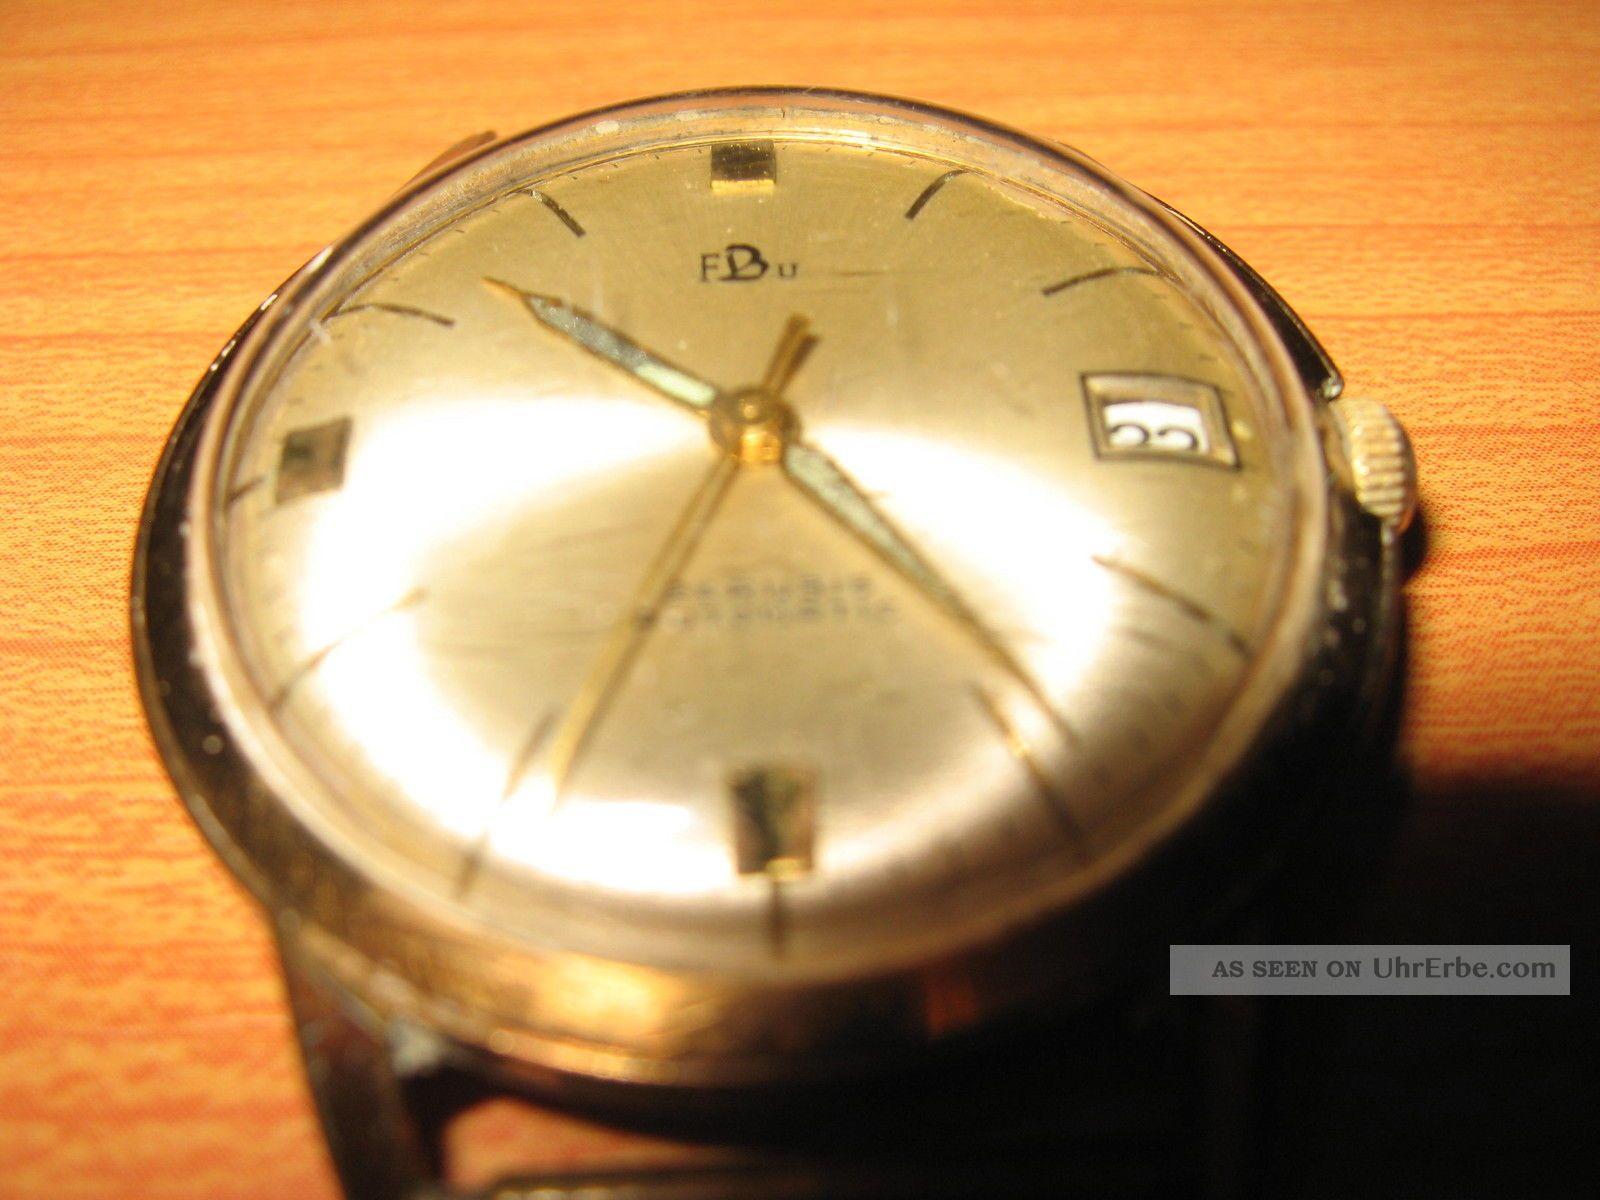 Fbu - Franz Burger - Alte Armbanduhr - 25 Rubine - Automatic Armbanduhren Bild